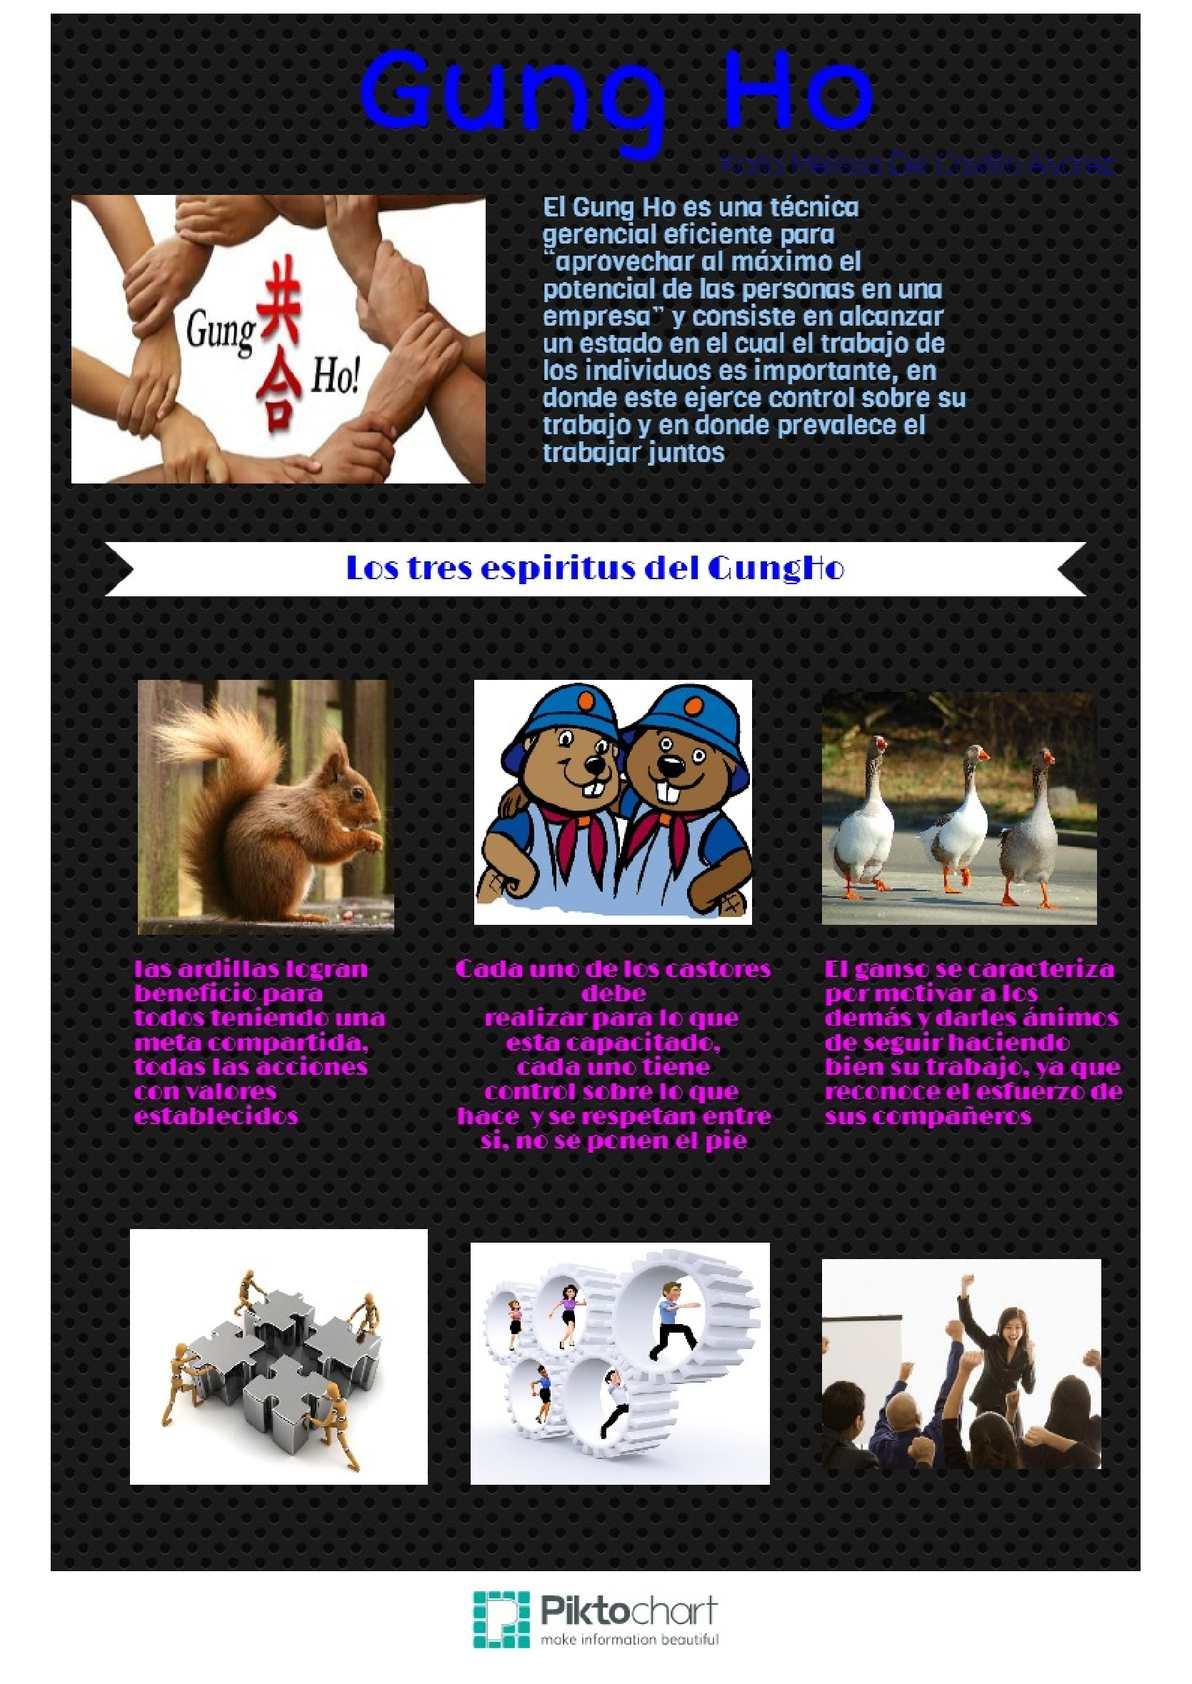 Calameo El Gung Ho Infographic How to use gung ho examples of gung ho in a sentence. calameo